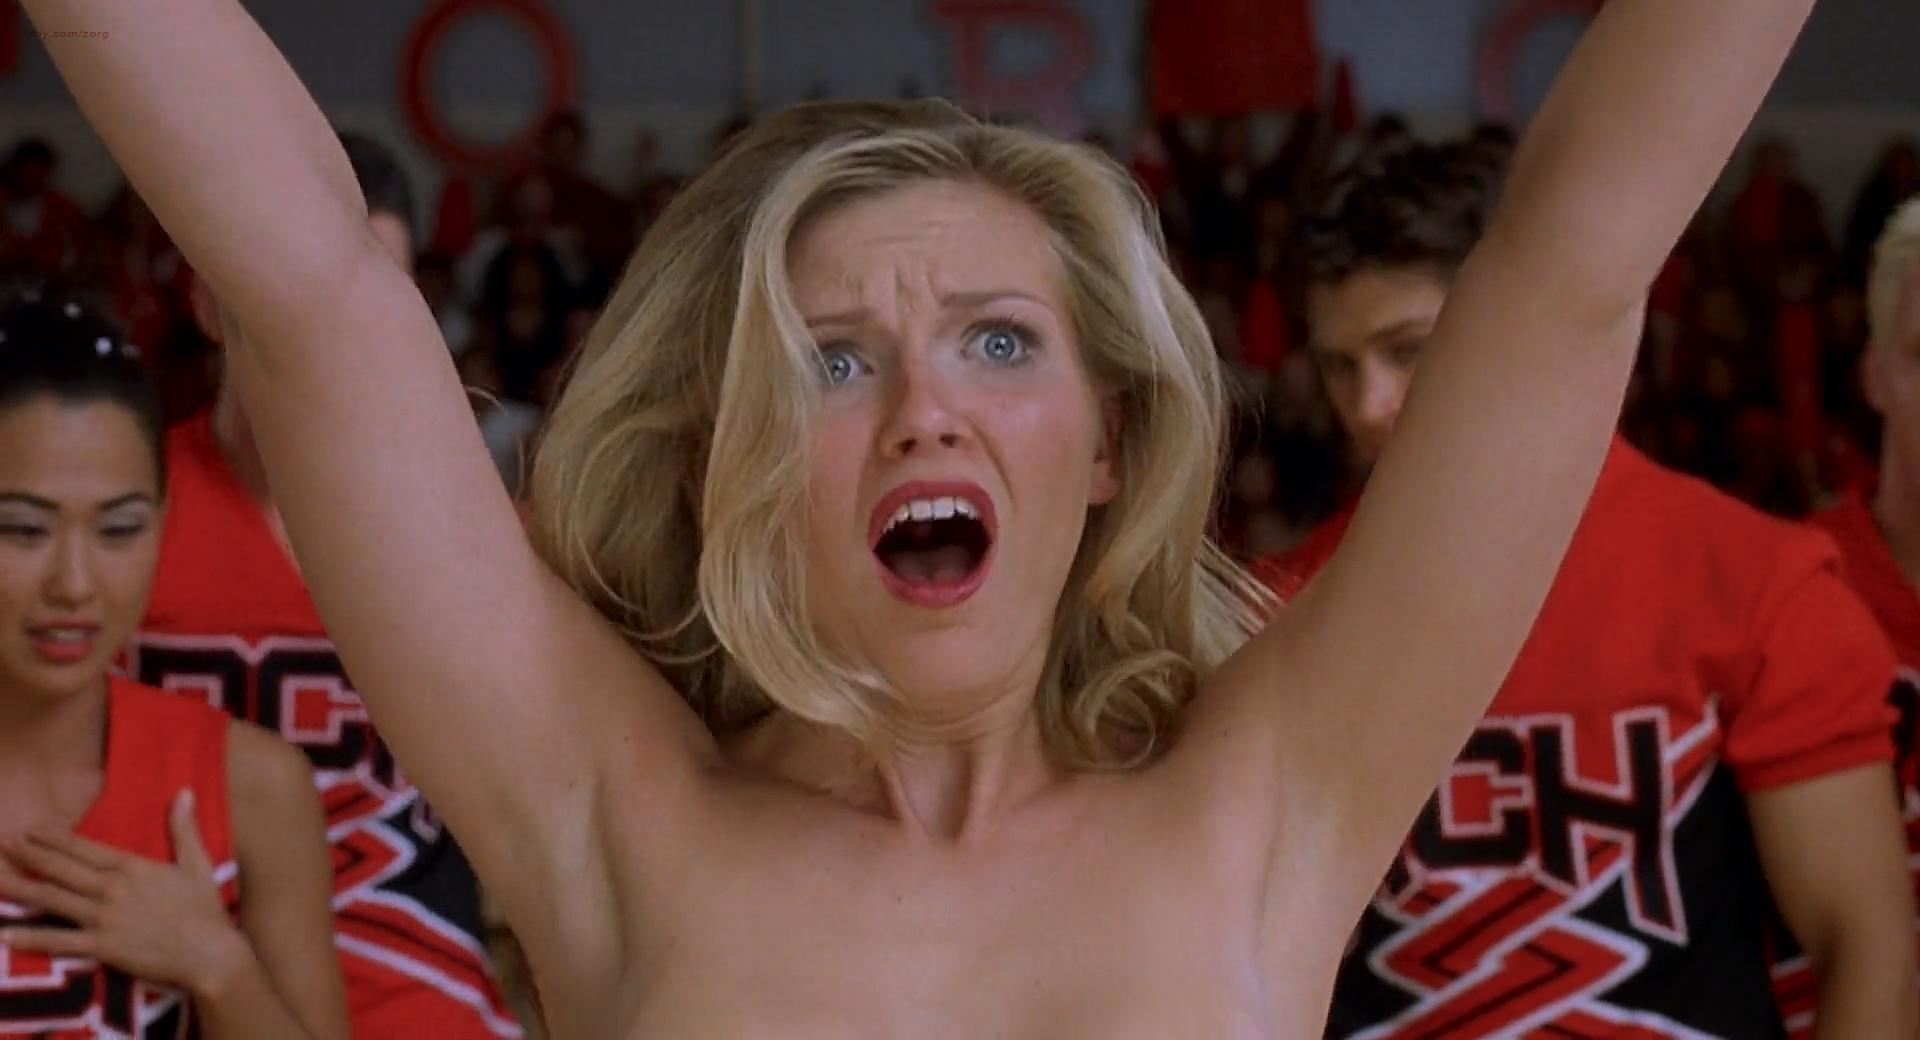 Kirsten Dunst hot bra and panties Eliza Dushku hot bikini - Bring It On 2000 HD 1080p BluRay (2)